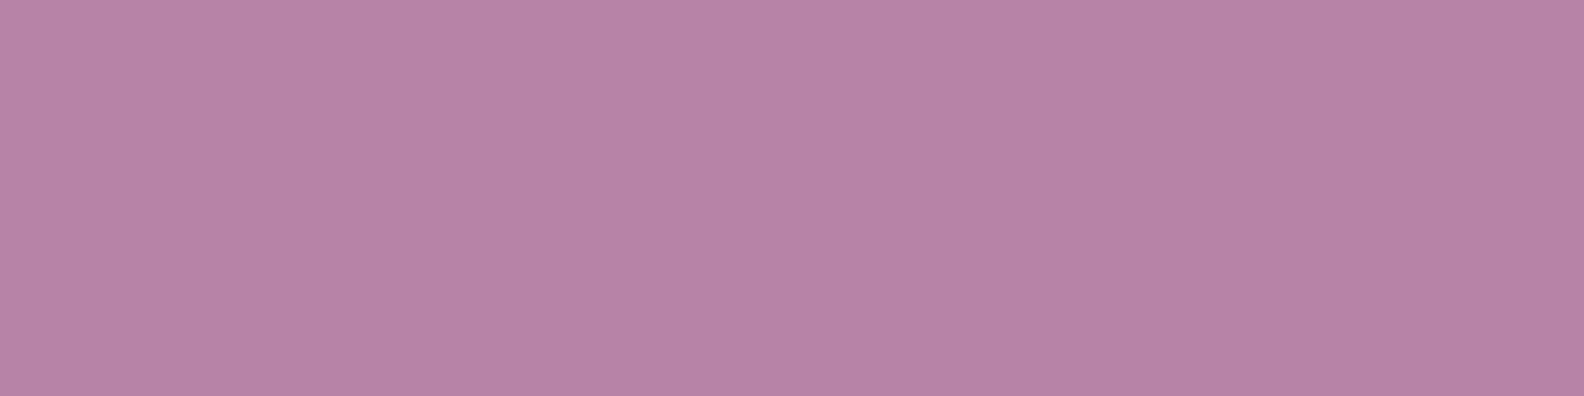 1584x396 Opera Mauve Solid Color Background